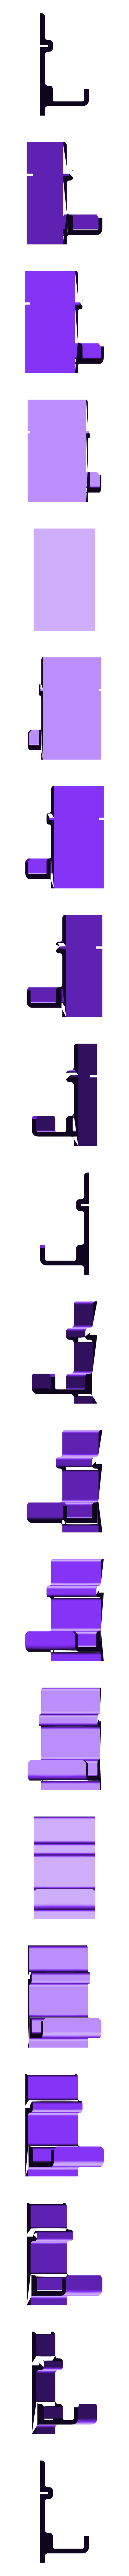 hook_20mm.stl Download free STL file FlashForge Adventurer3 Mirror Hook • 3D printing template, CyberCyclist